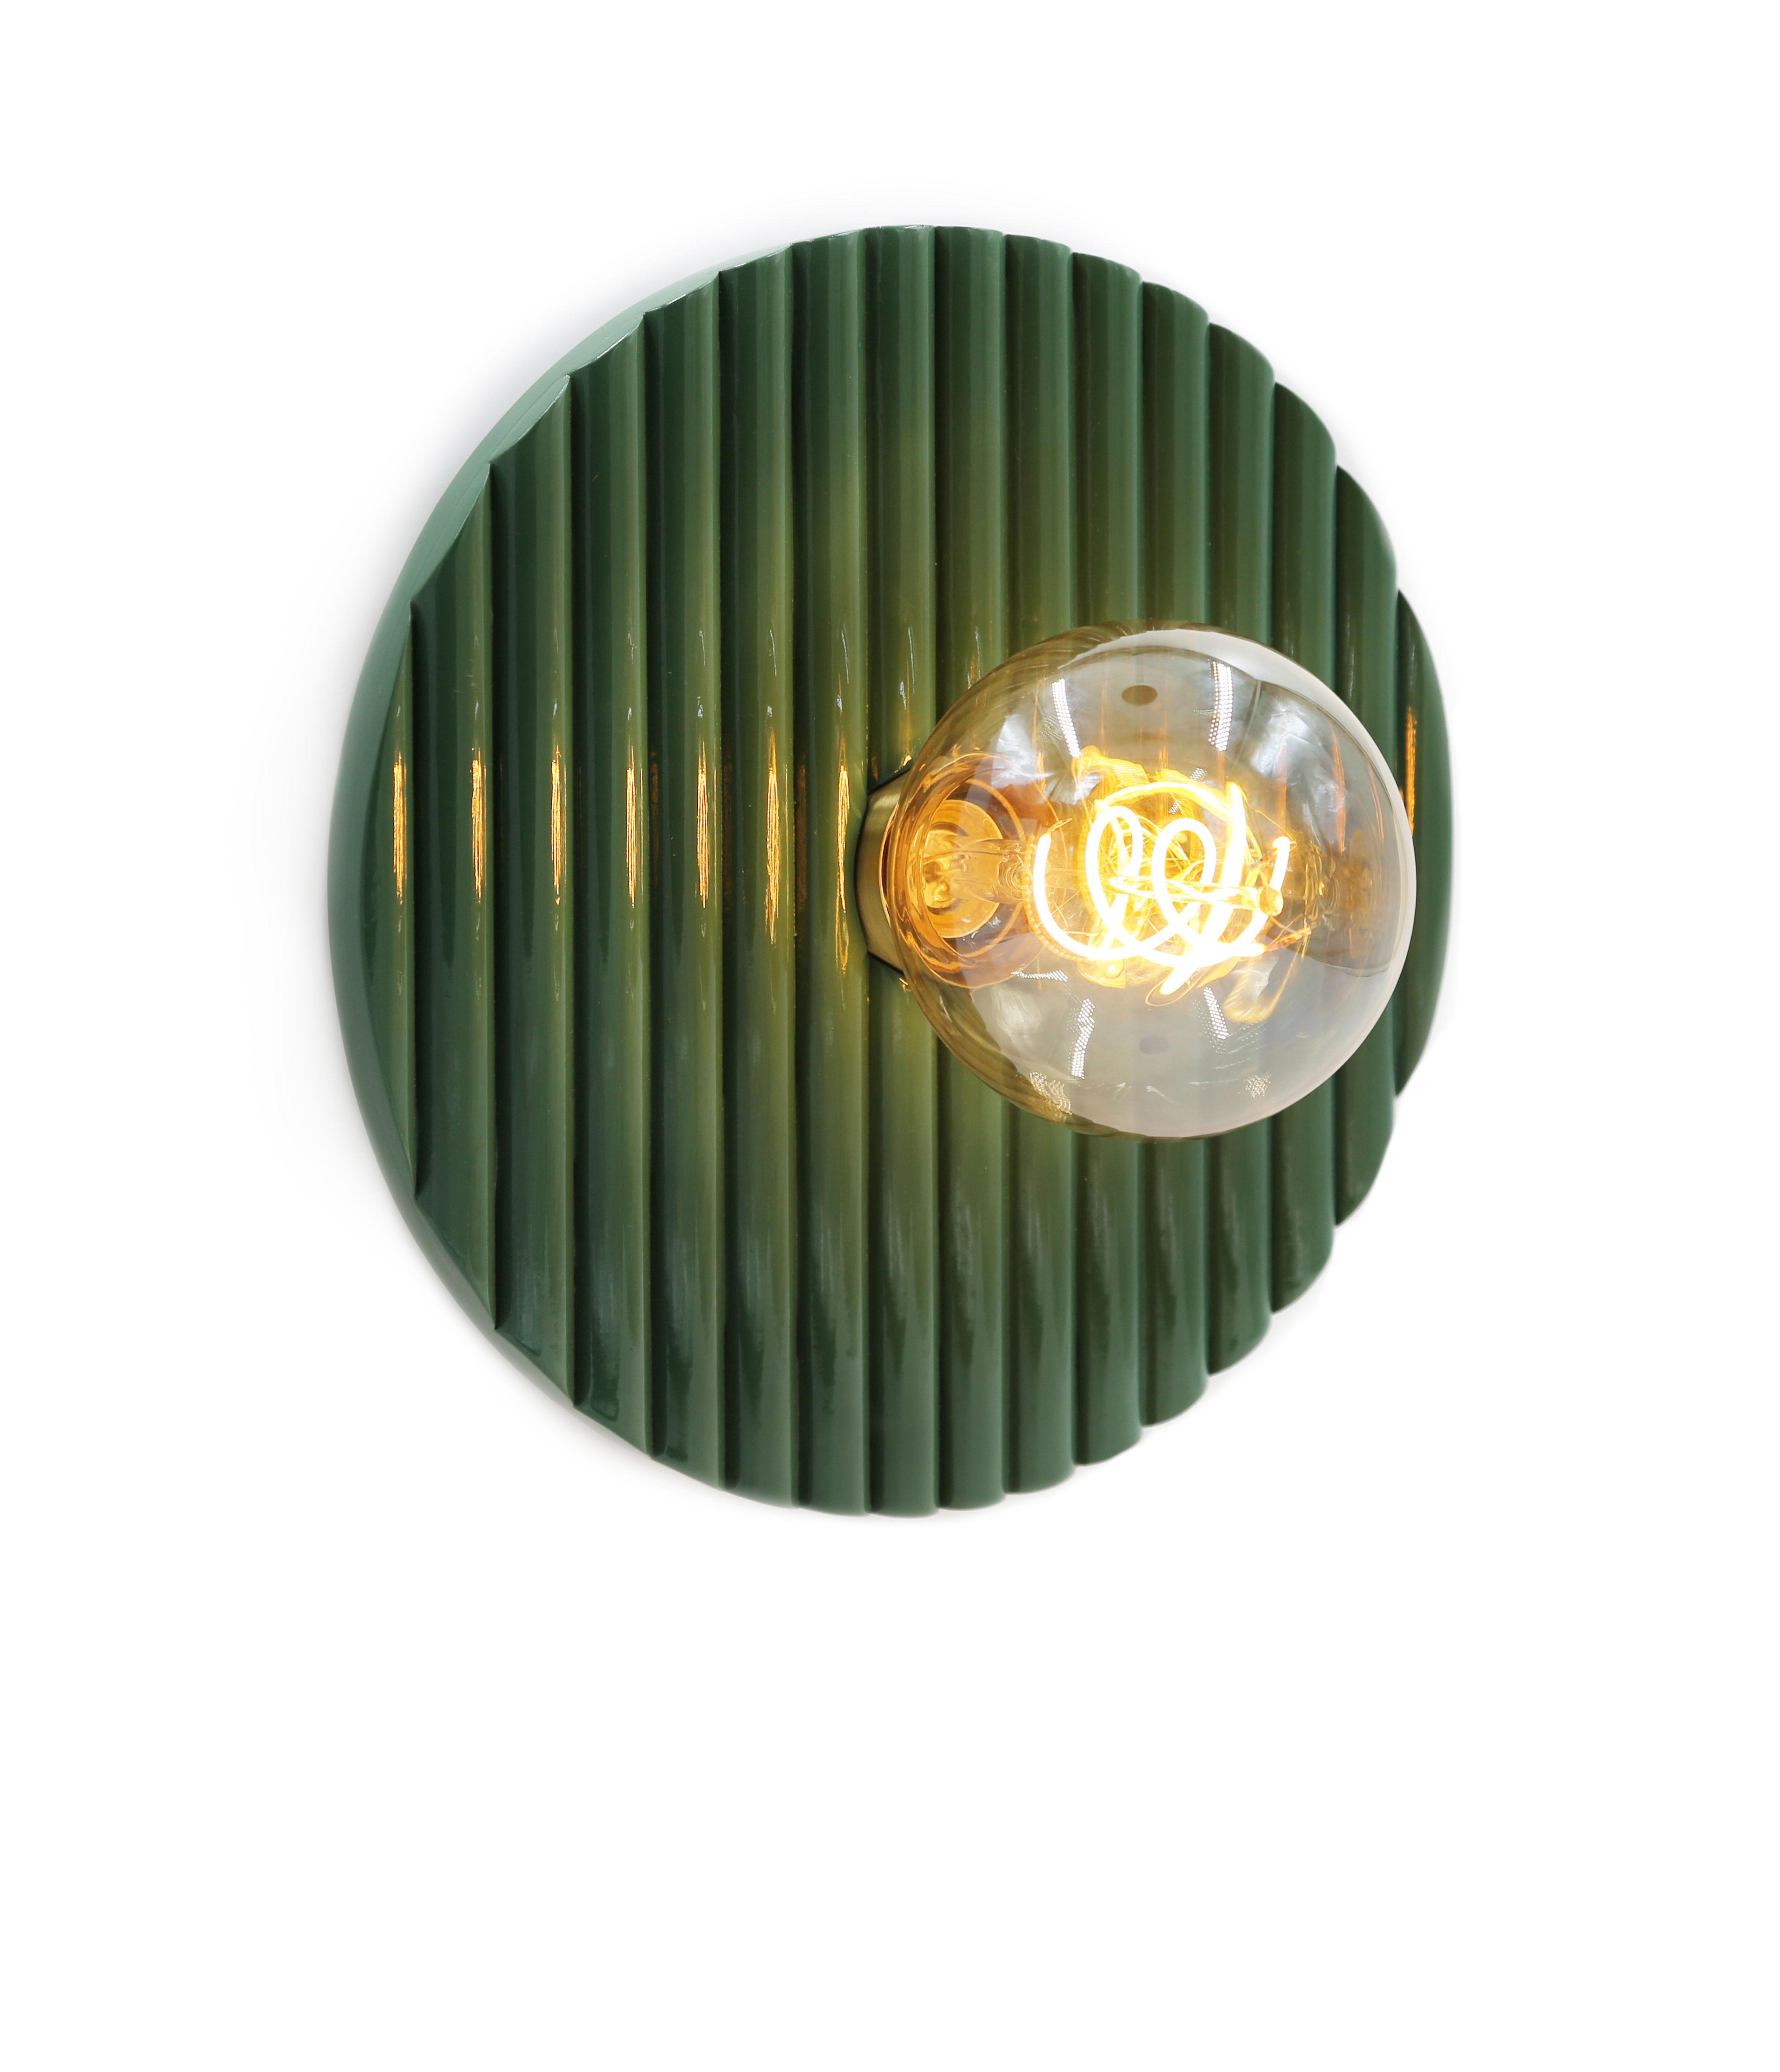 applique riviera maison sarah lavoine vert 25 made. Black Bedroom Furniture Sets. Home Design Ideas